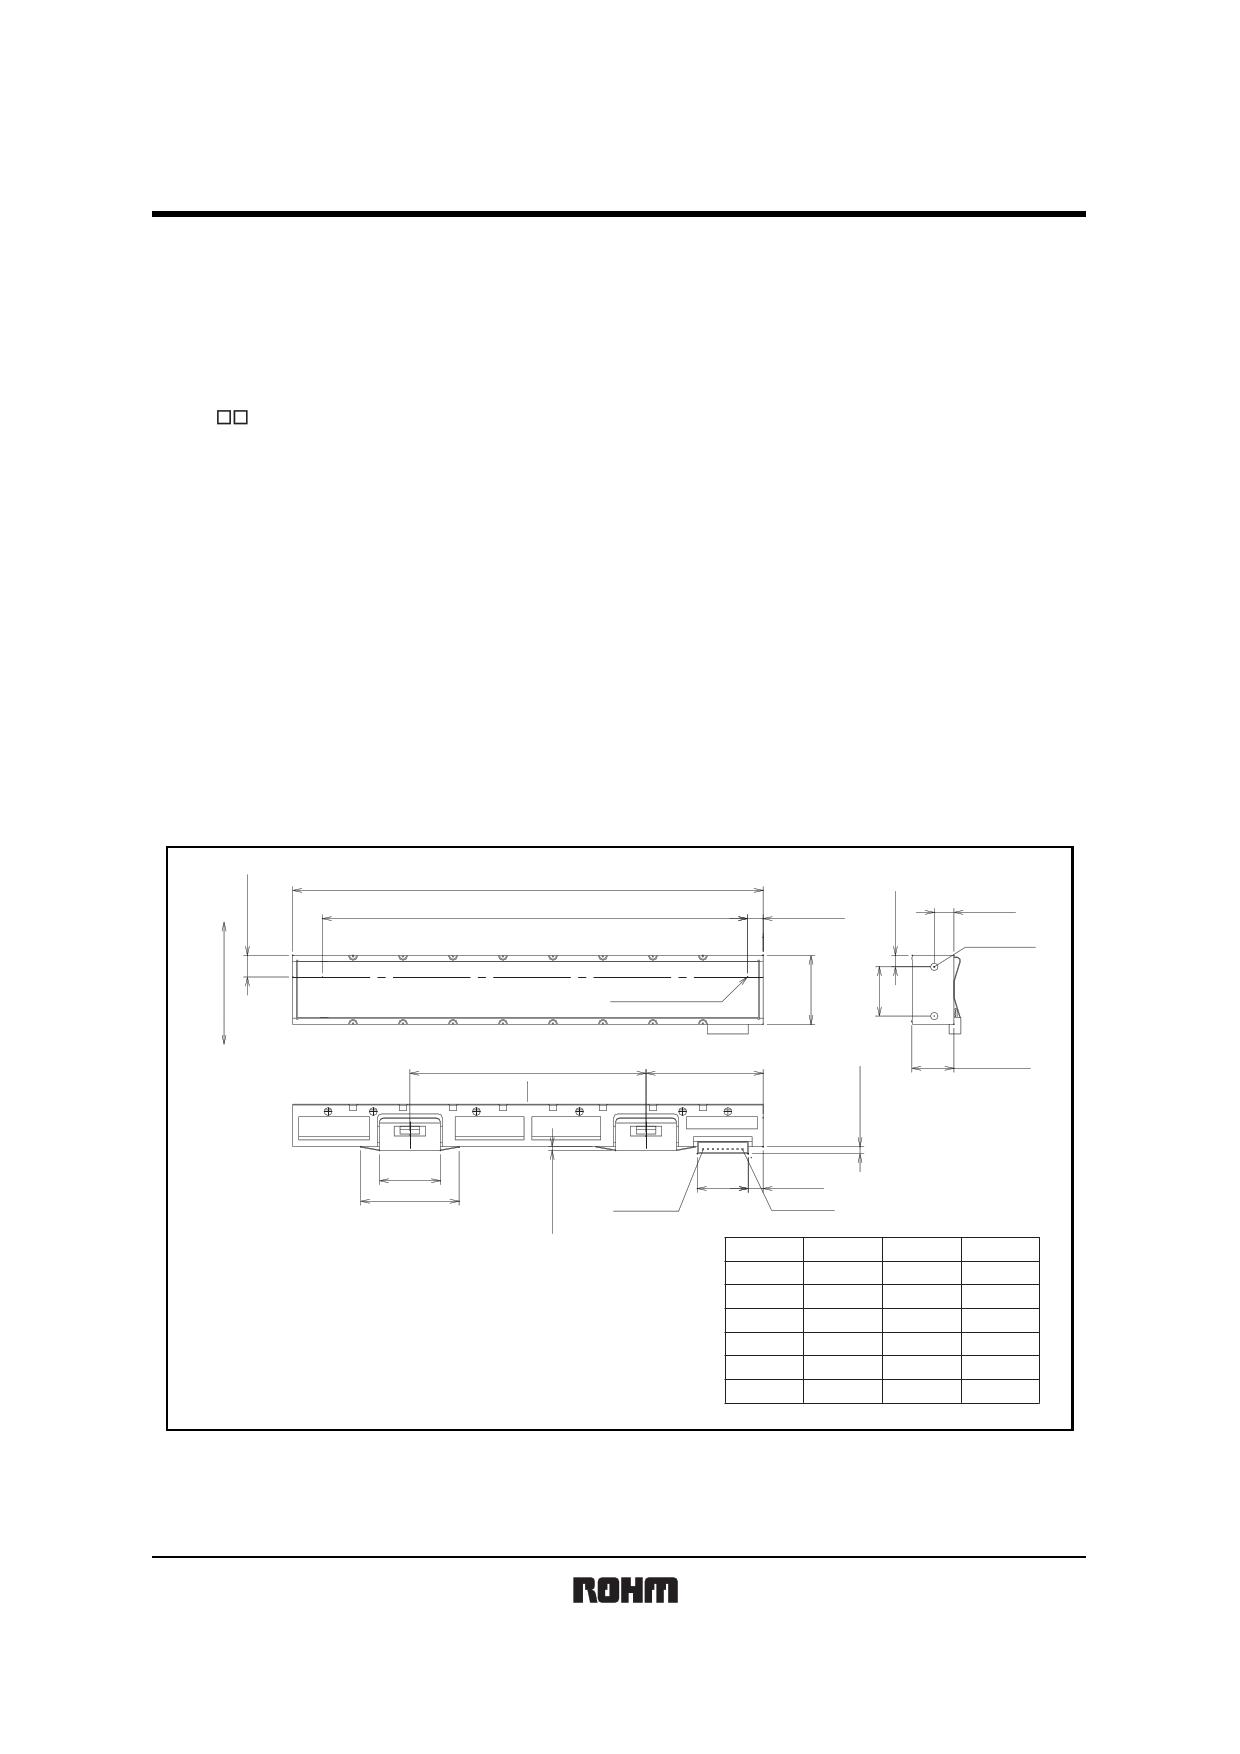 IA2004-CE40A datasheet